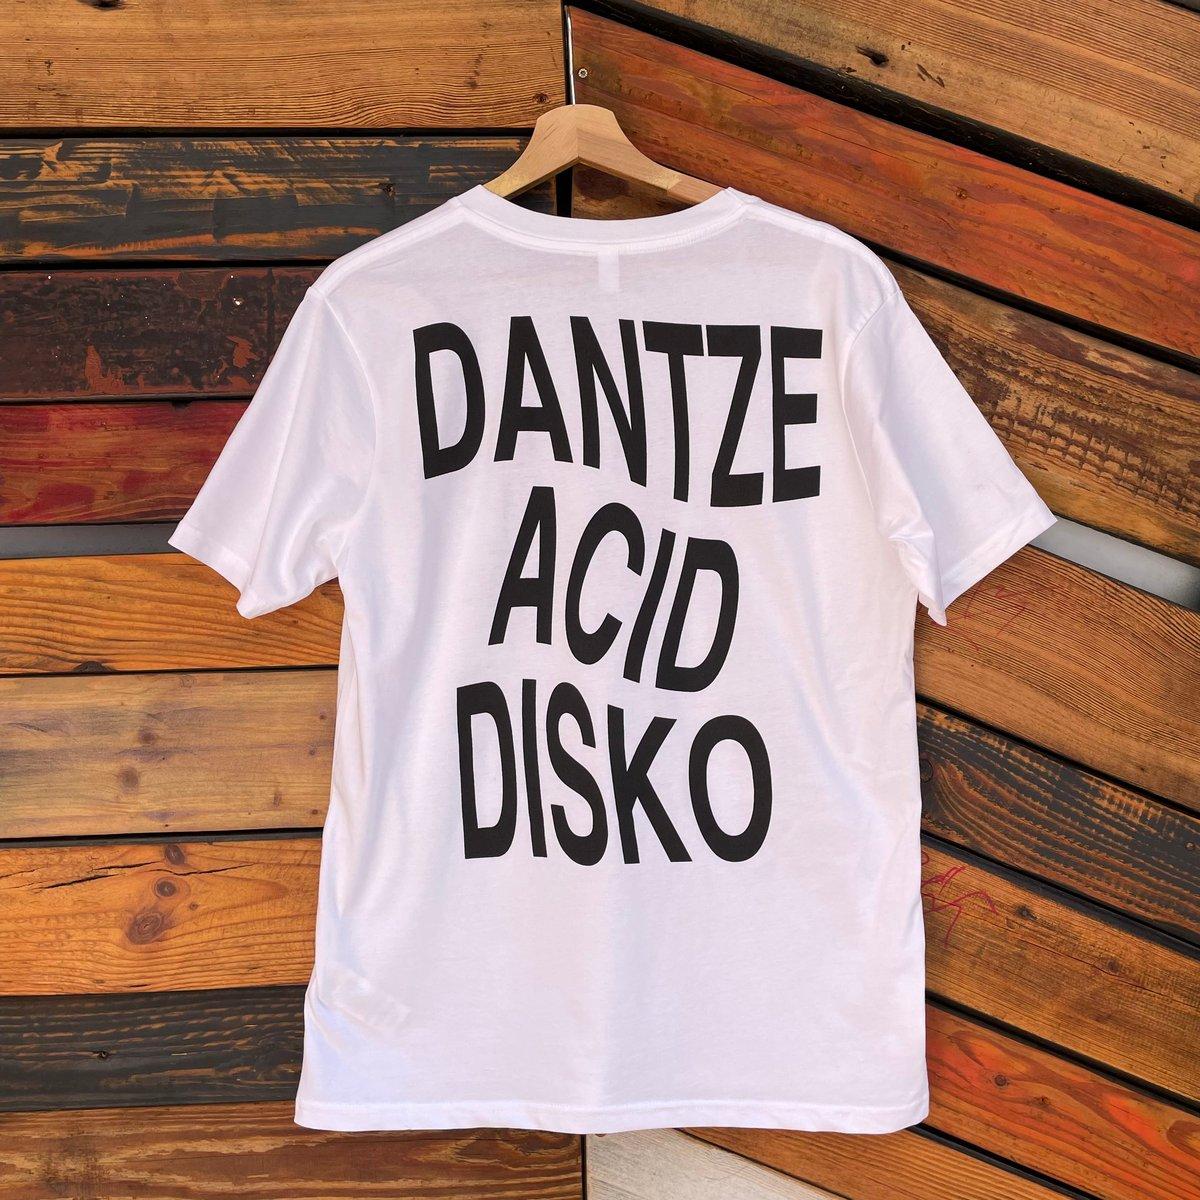 """Dantze Acid Disko"" Shirt white - by Dantze"